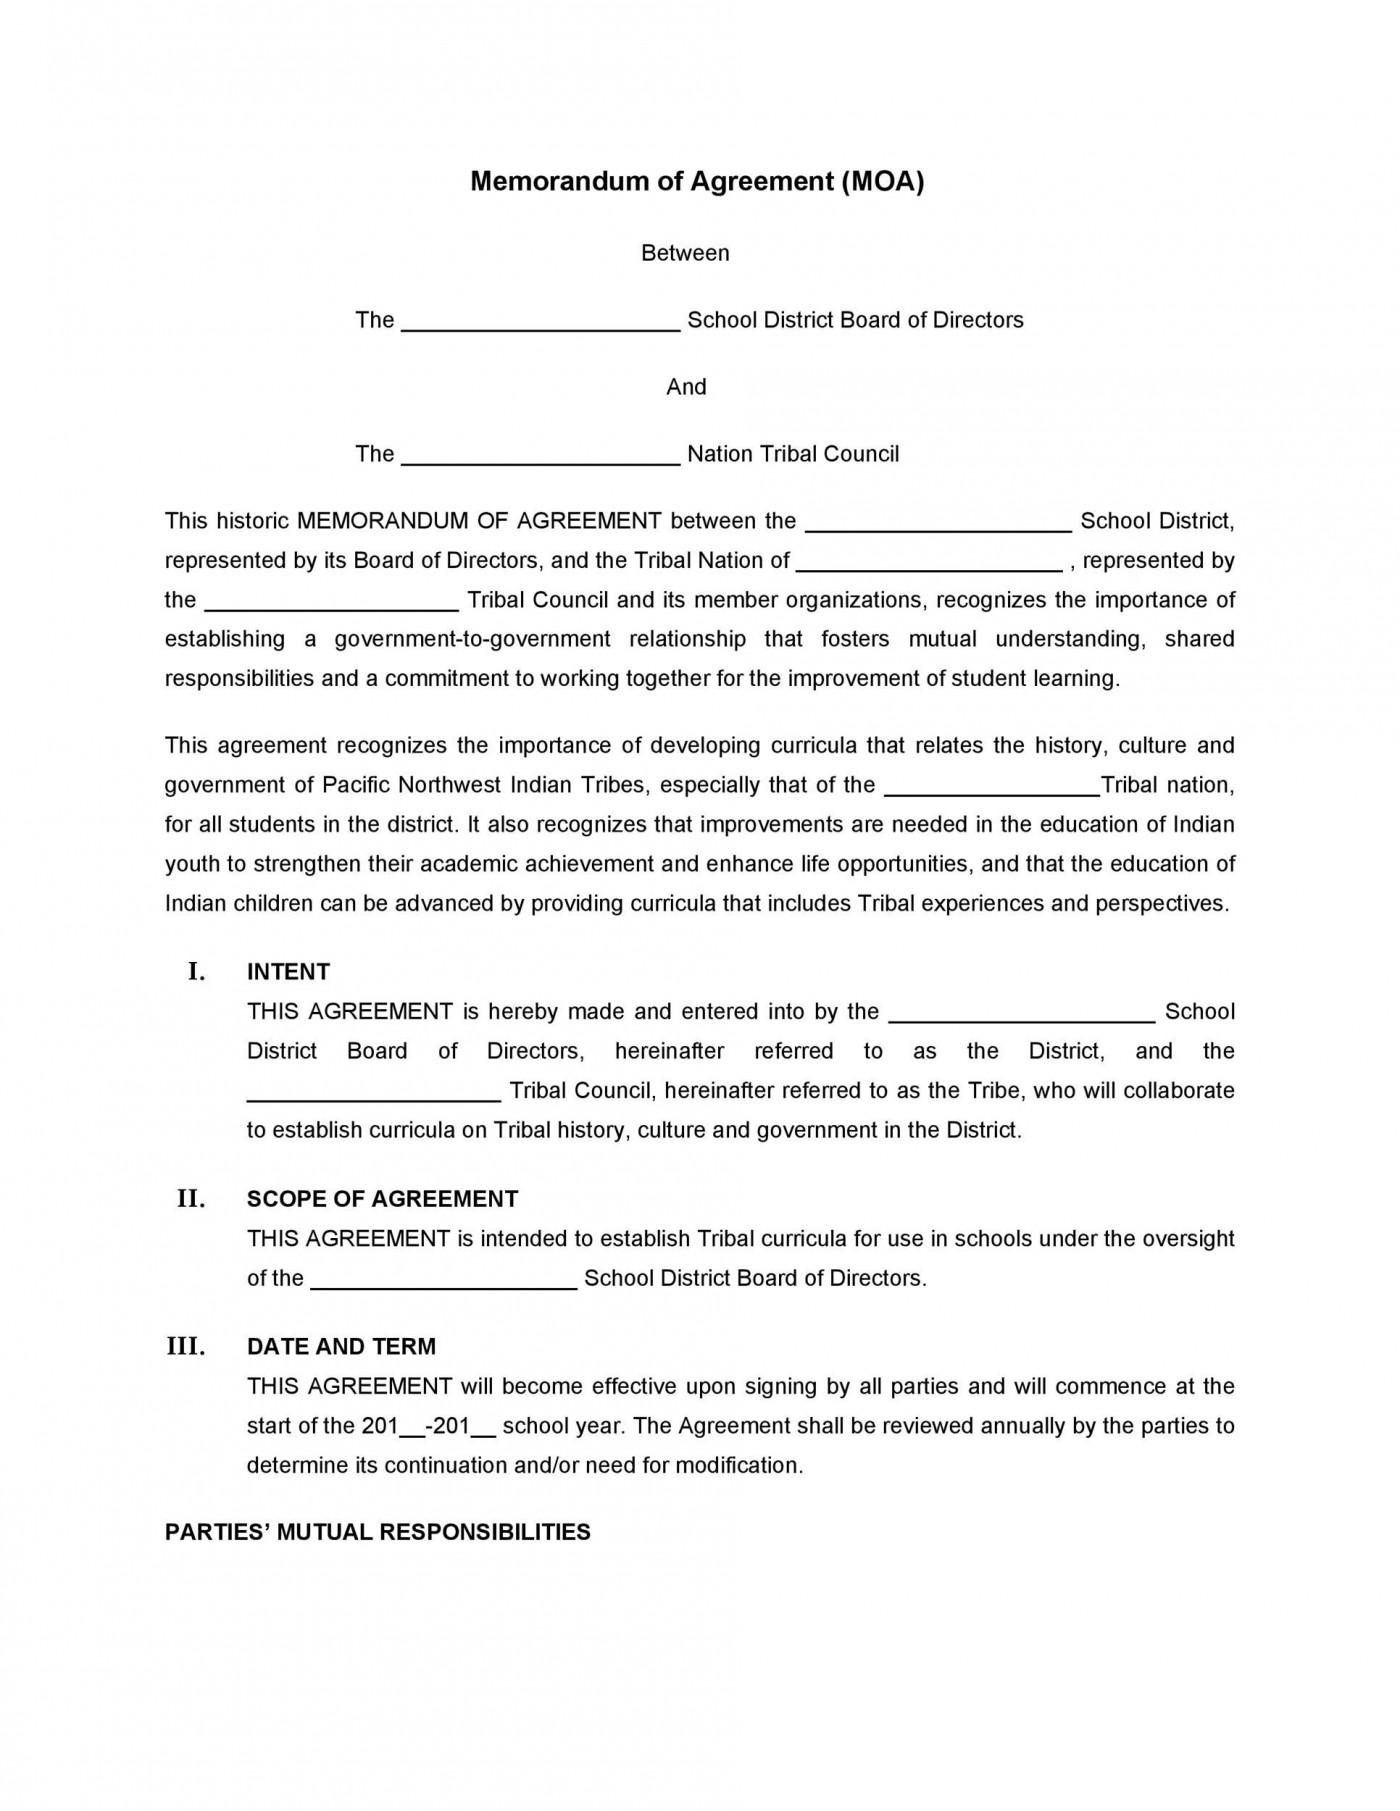 000 Phenomenal Private Placement Memorandum Outline High Resolution  Template Offering Sample Film1400